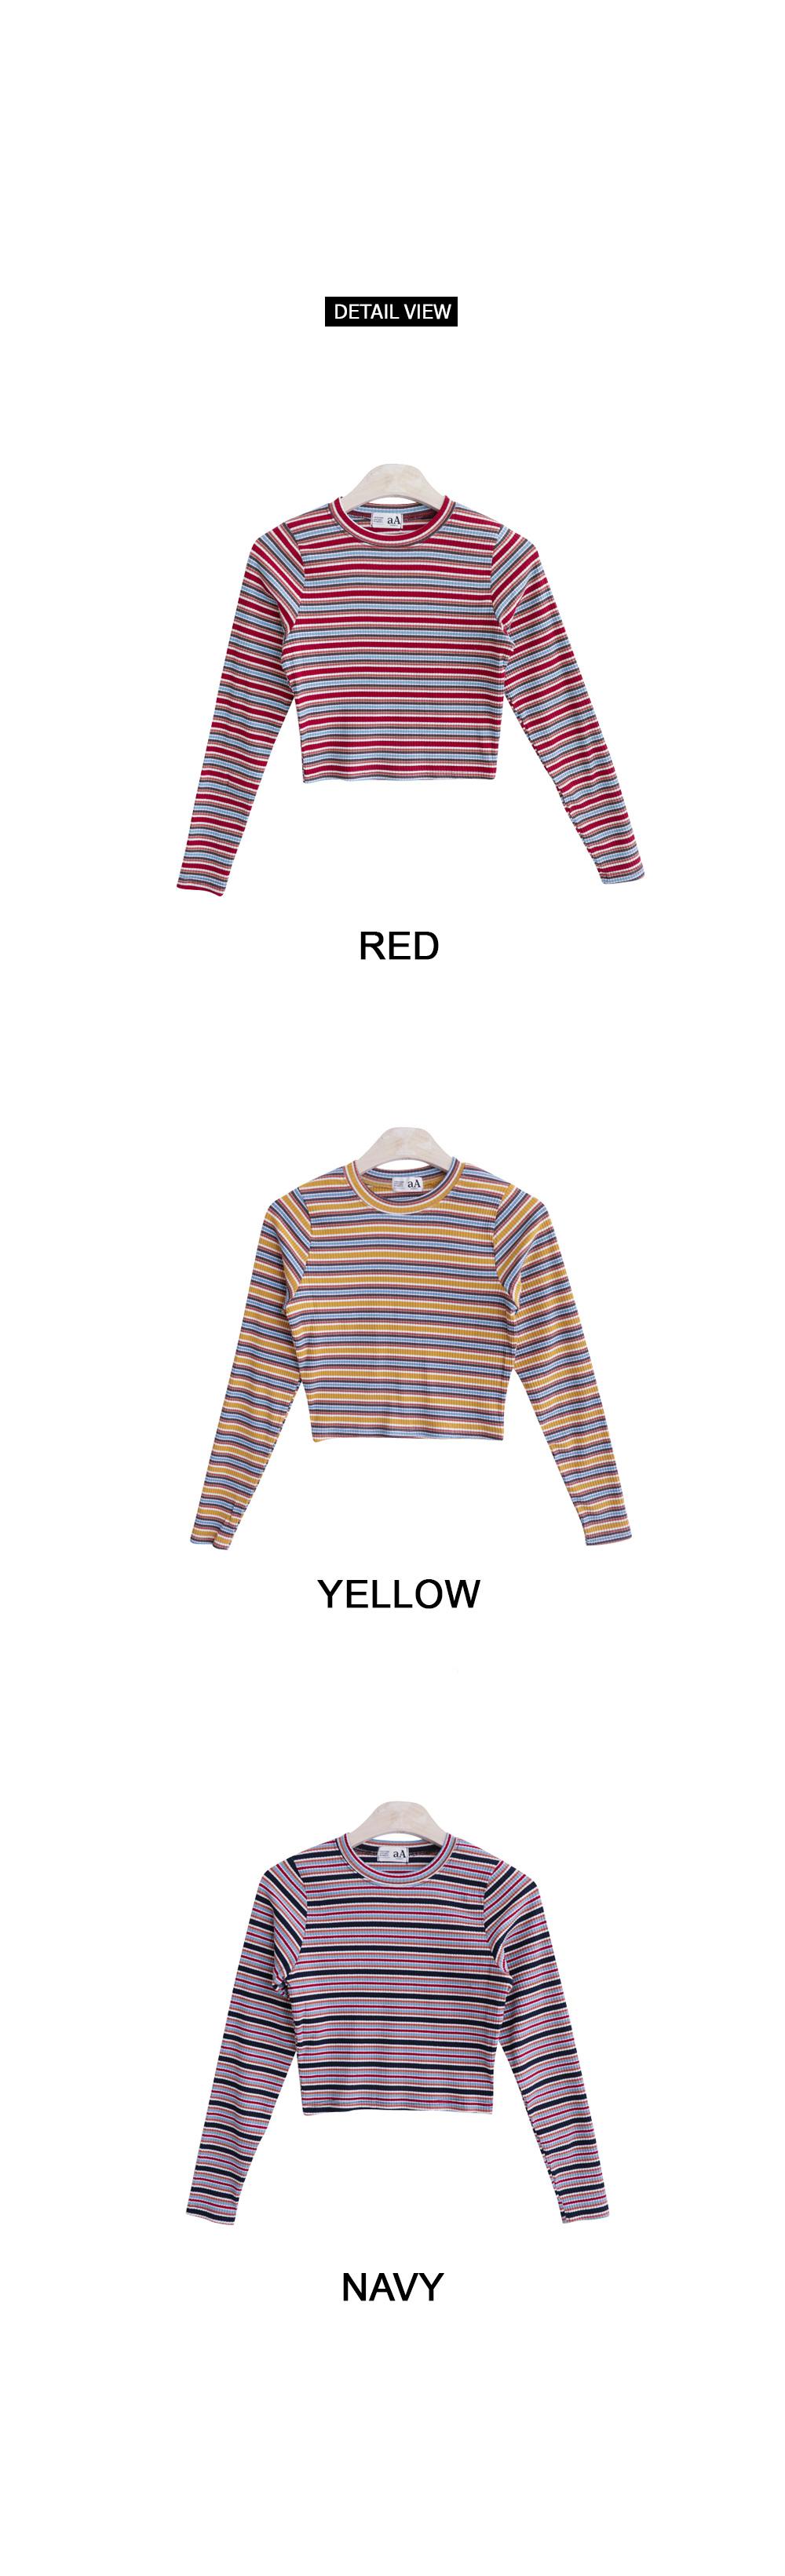 Caramel striped T-shirt